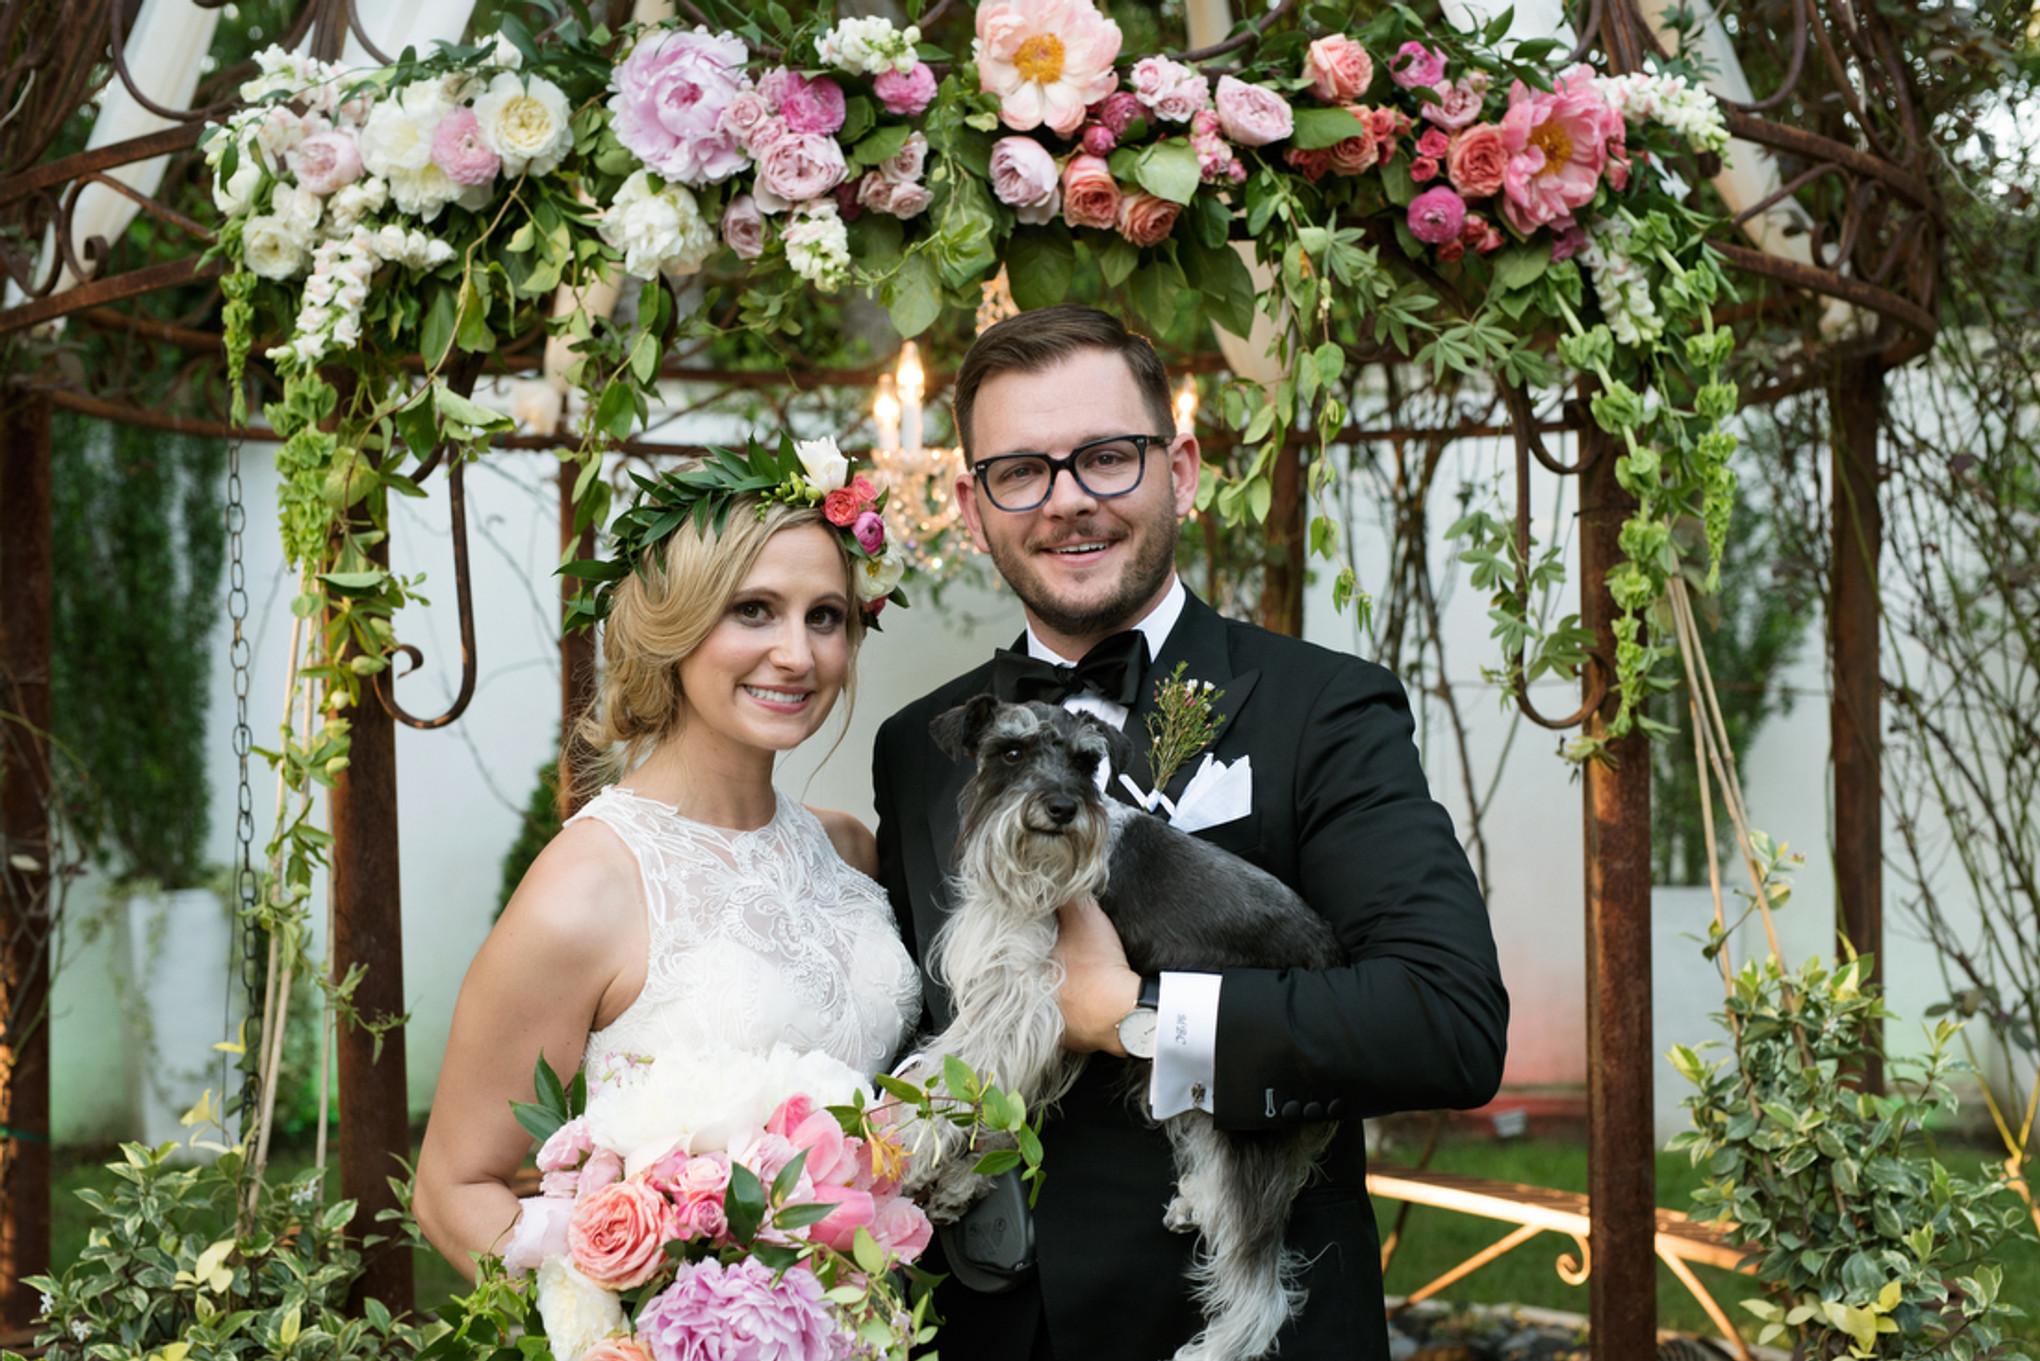 5 hotels for a pet-friendly wedding - Bridestory Blog